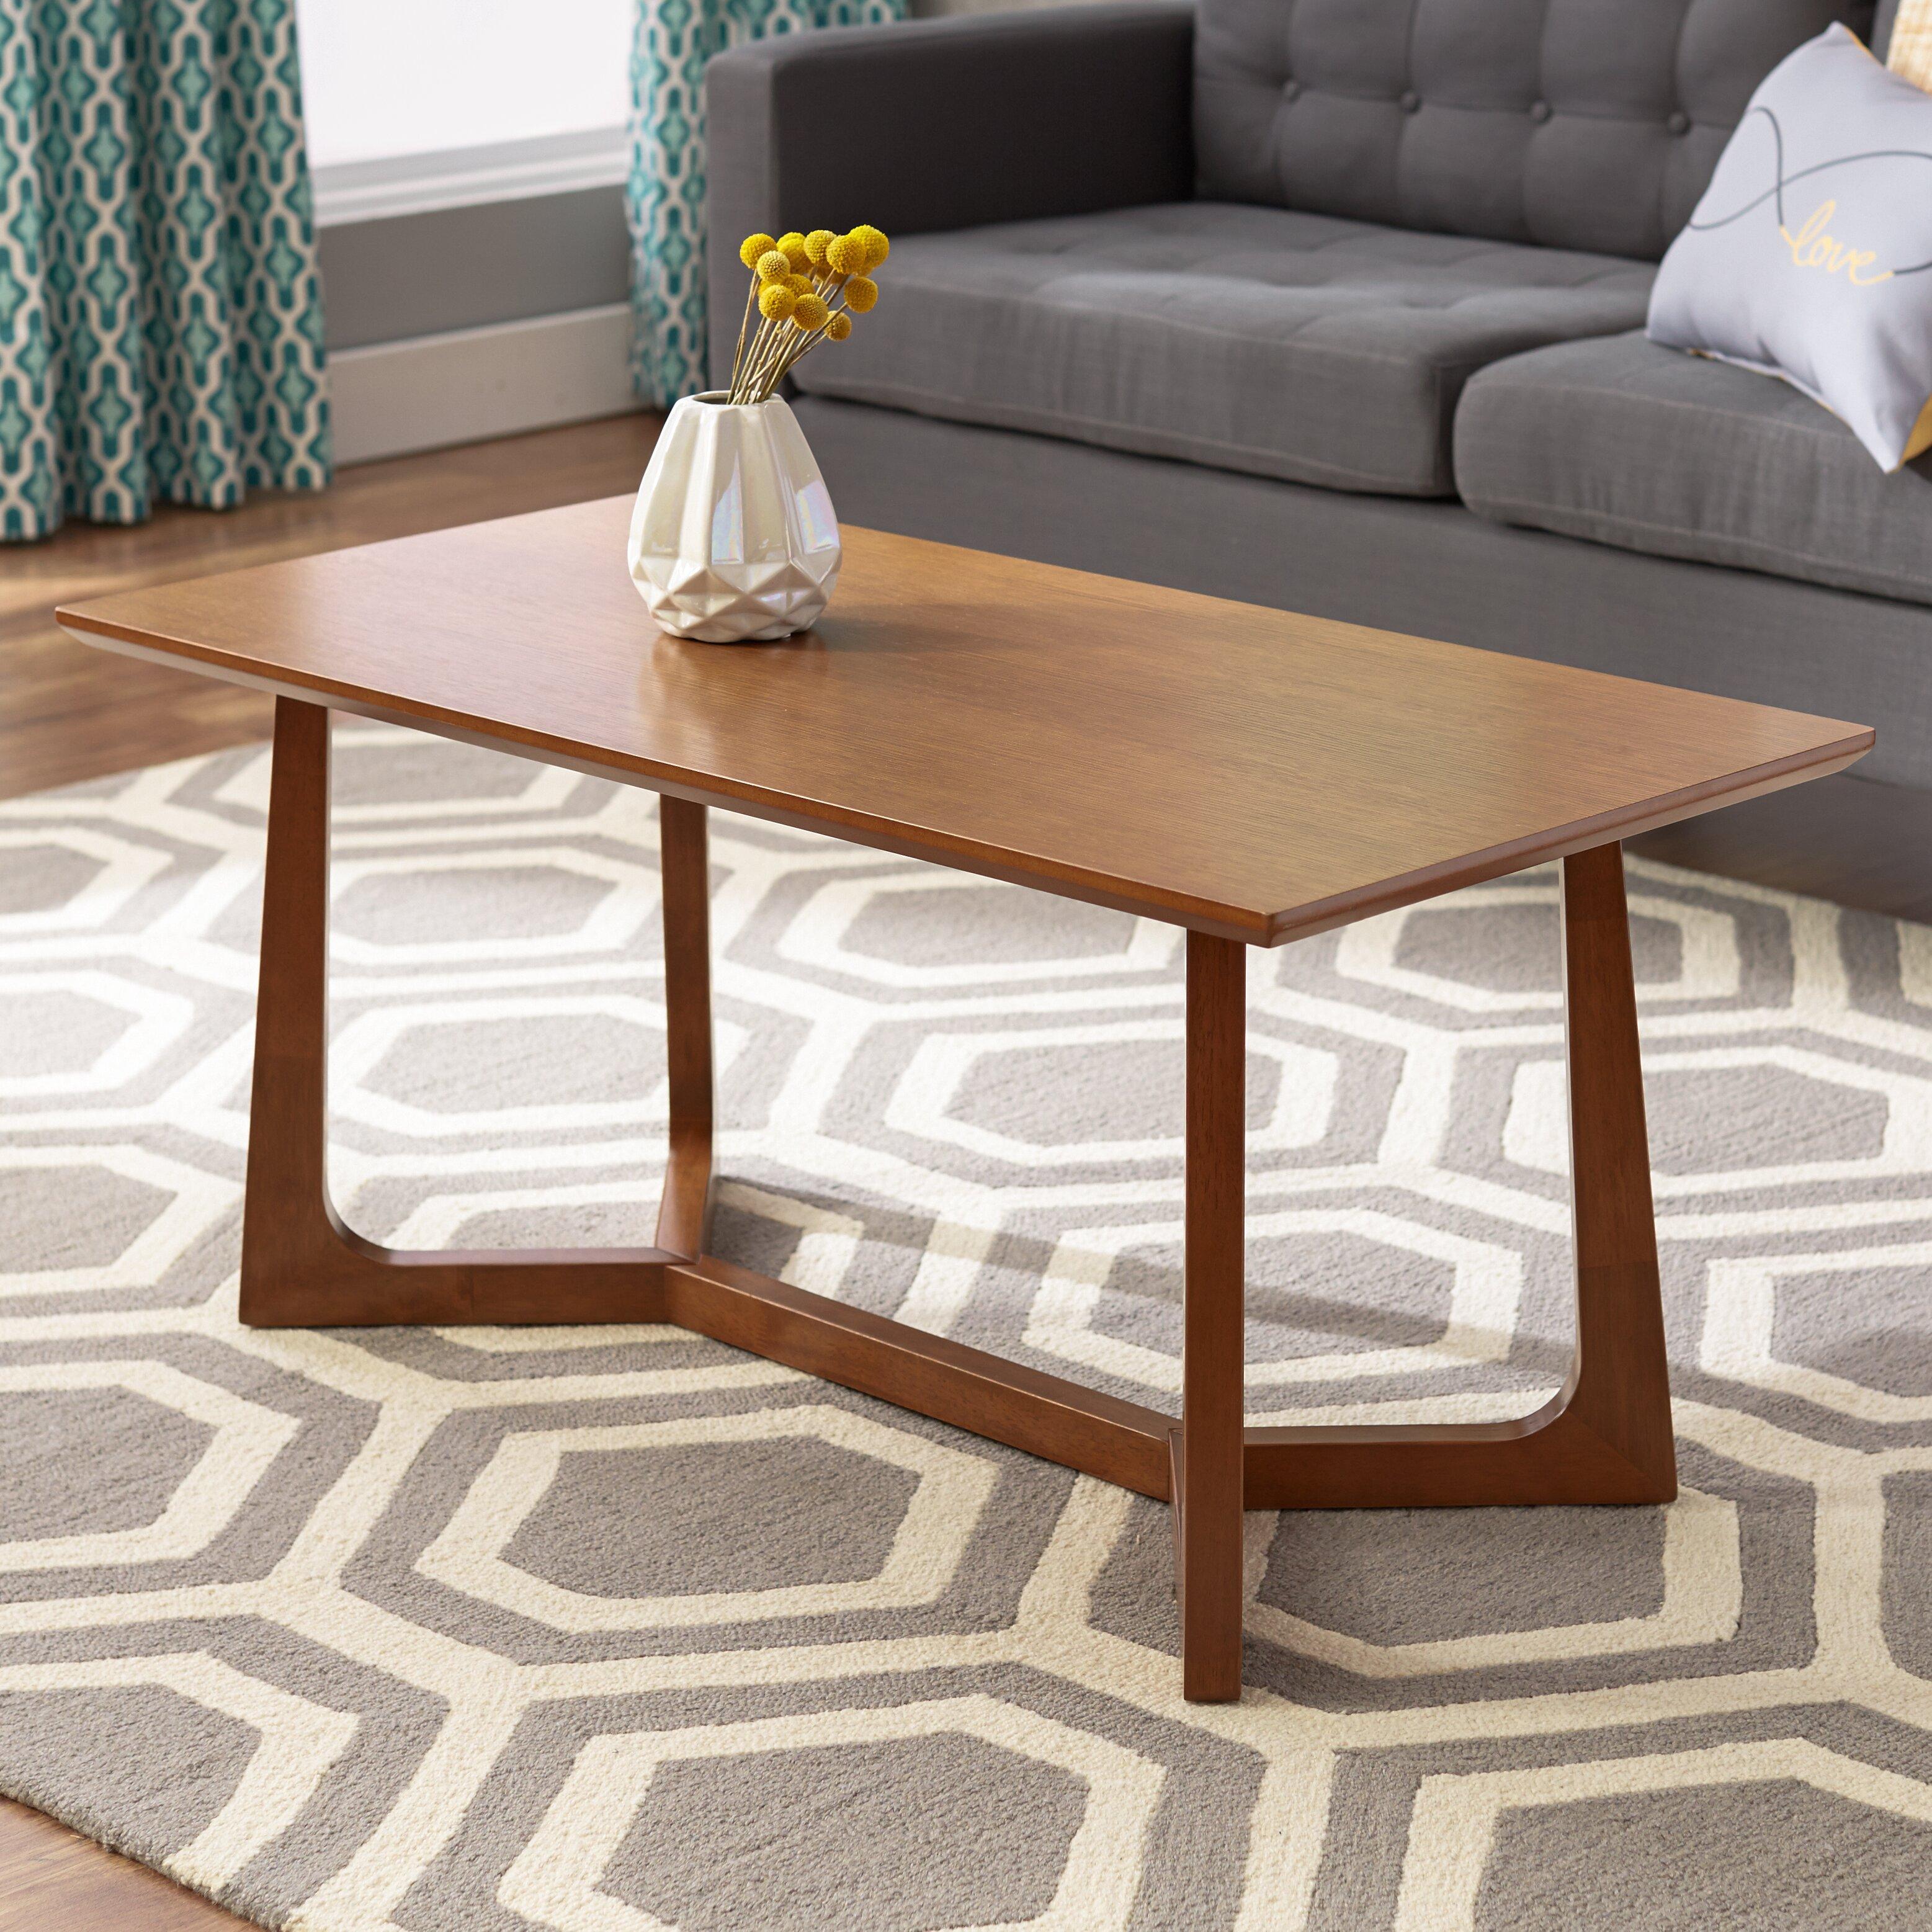 Coffee Table Sets At Wayfair: Mercury Row Epsilon Indi Coffee Table & Reviews